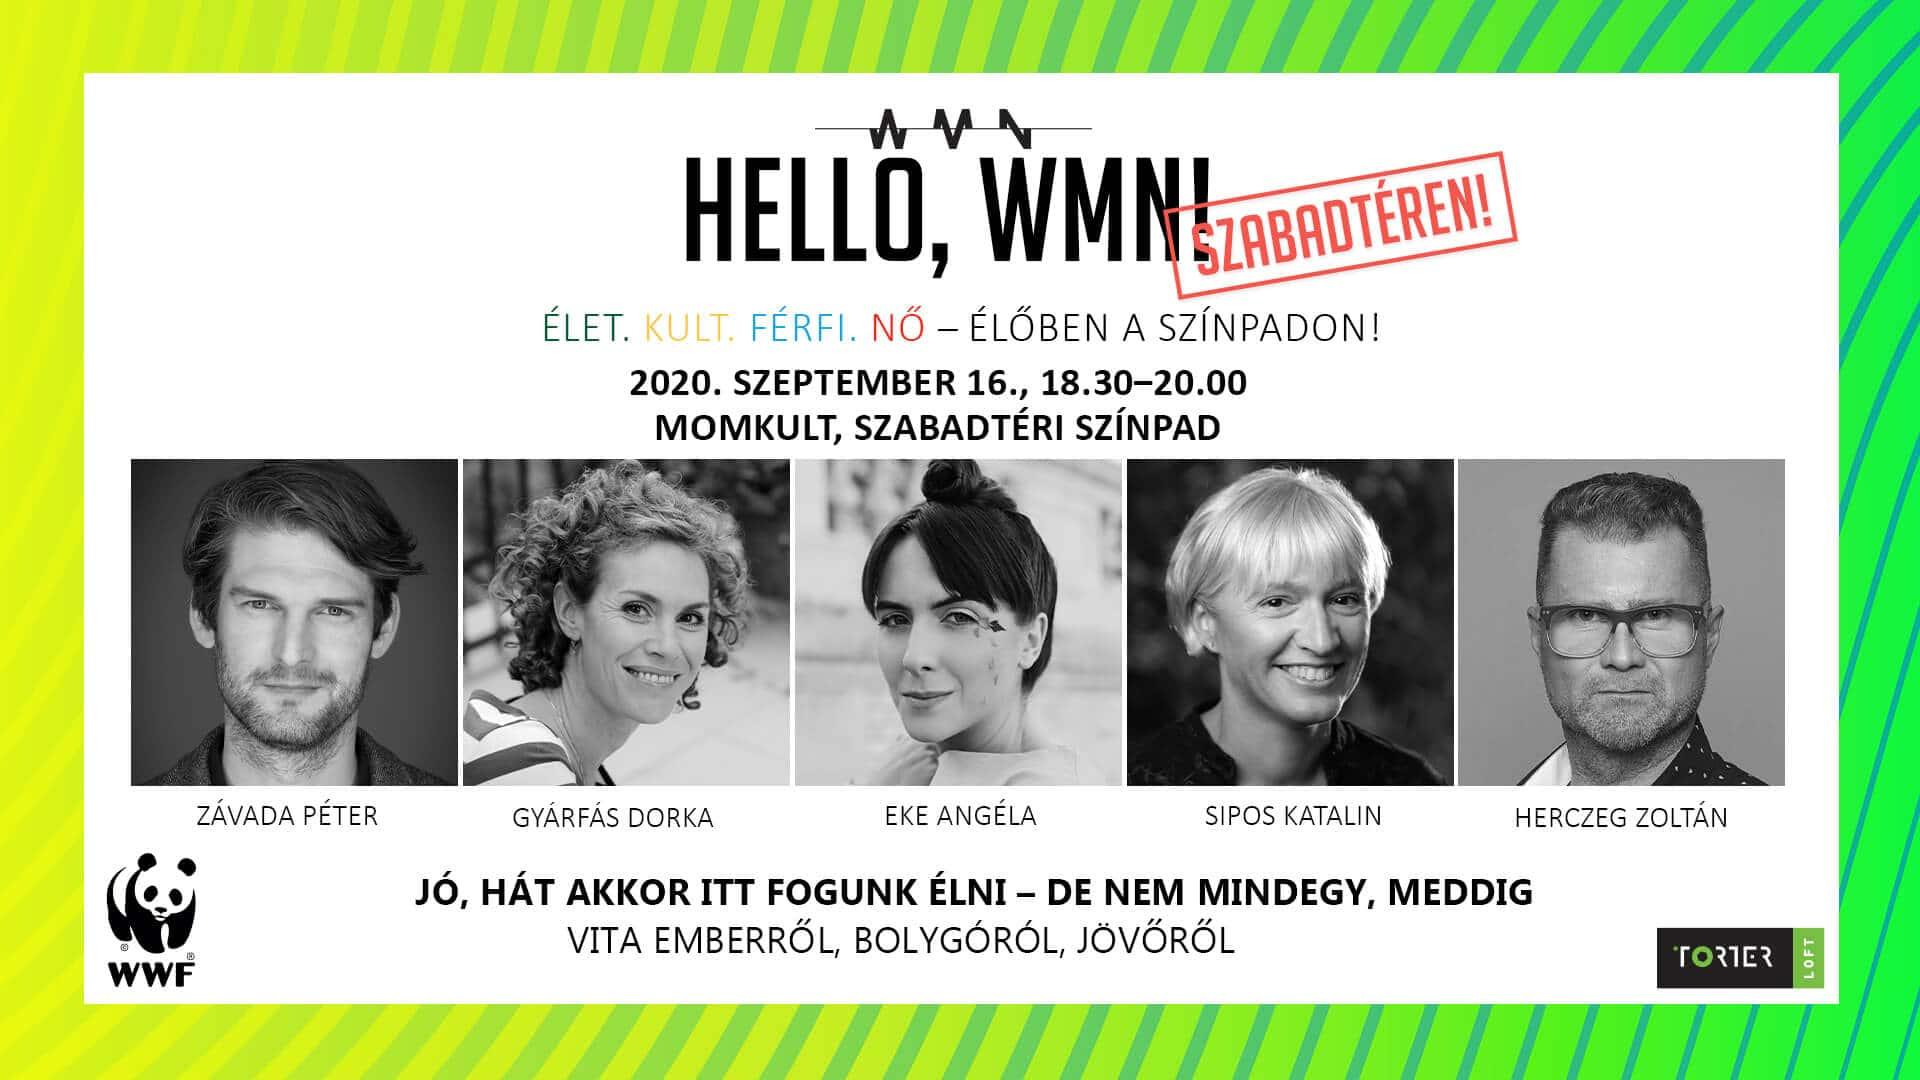 Hello, WMN! – SZABADTÉREN!